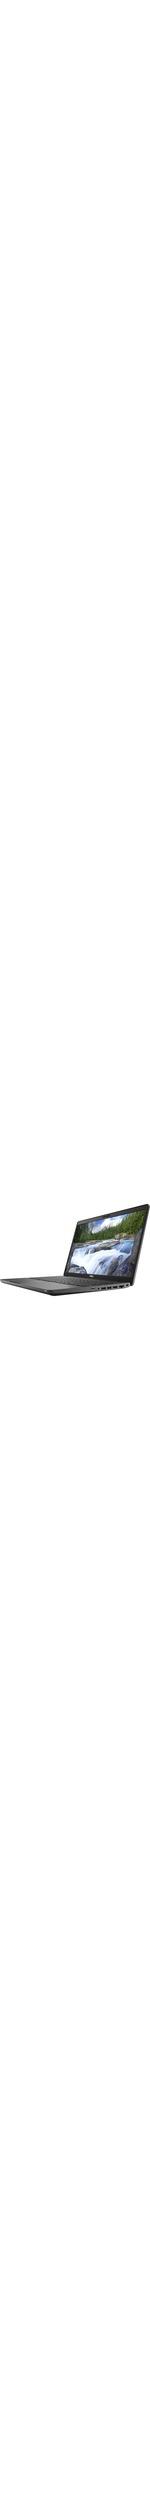 Dell Precision 3000 3540 39.6 cm 15.6And#34; Mobile Workstation - 1920 x 1080 - Core i7 i7-8565U - 8 GB RAM - 256 GB SSD - Black - Windows 10 Pro 64-bit - AMD Radeon Pro